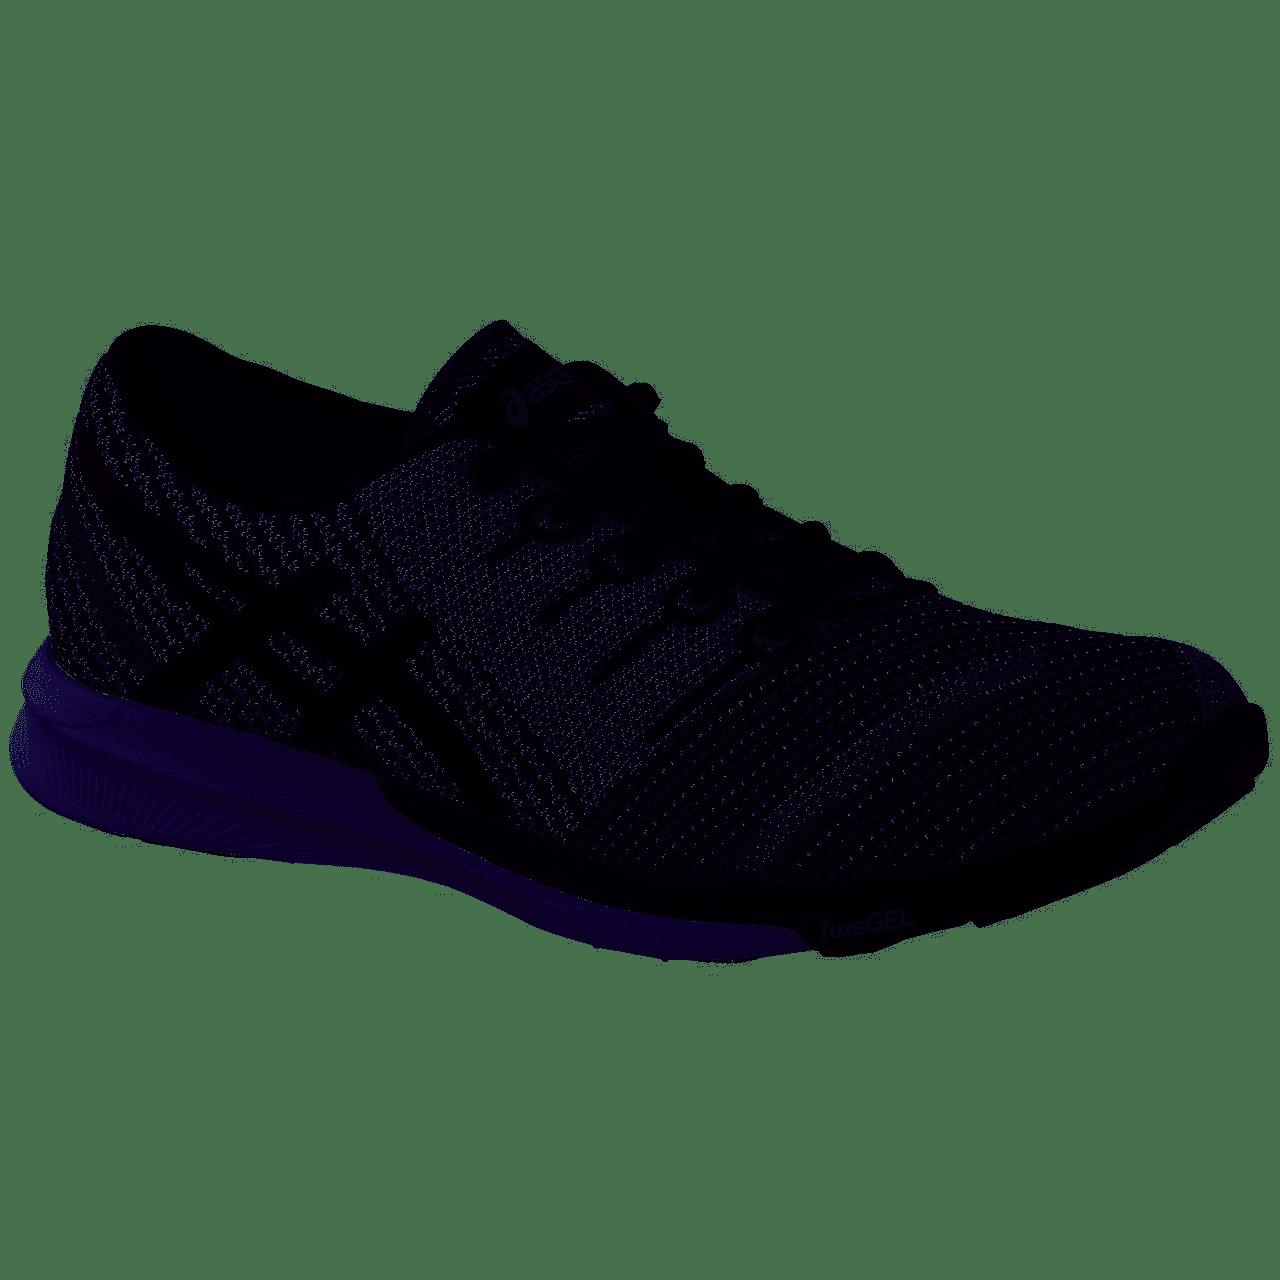 02d1f8771409 Asics T829N 9790 fuzeX Knit Carbon Black White Men s Running Shoes ...